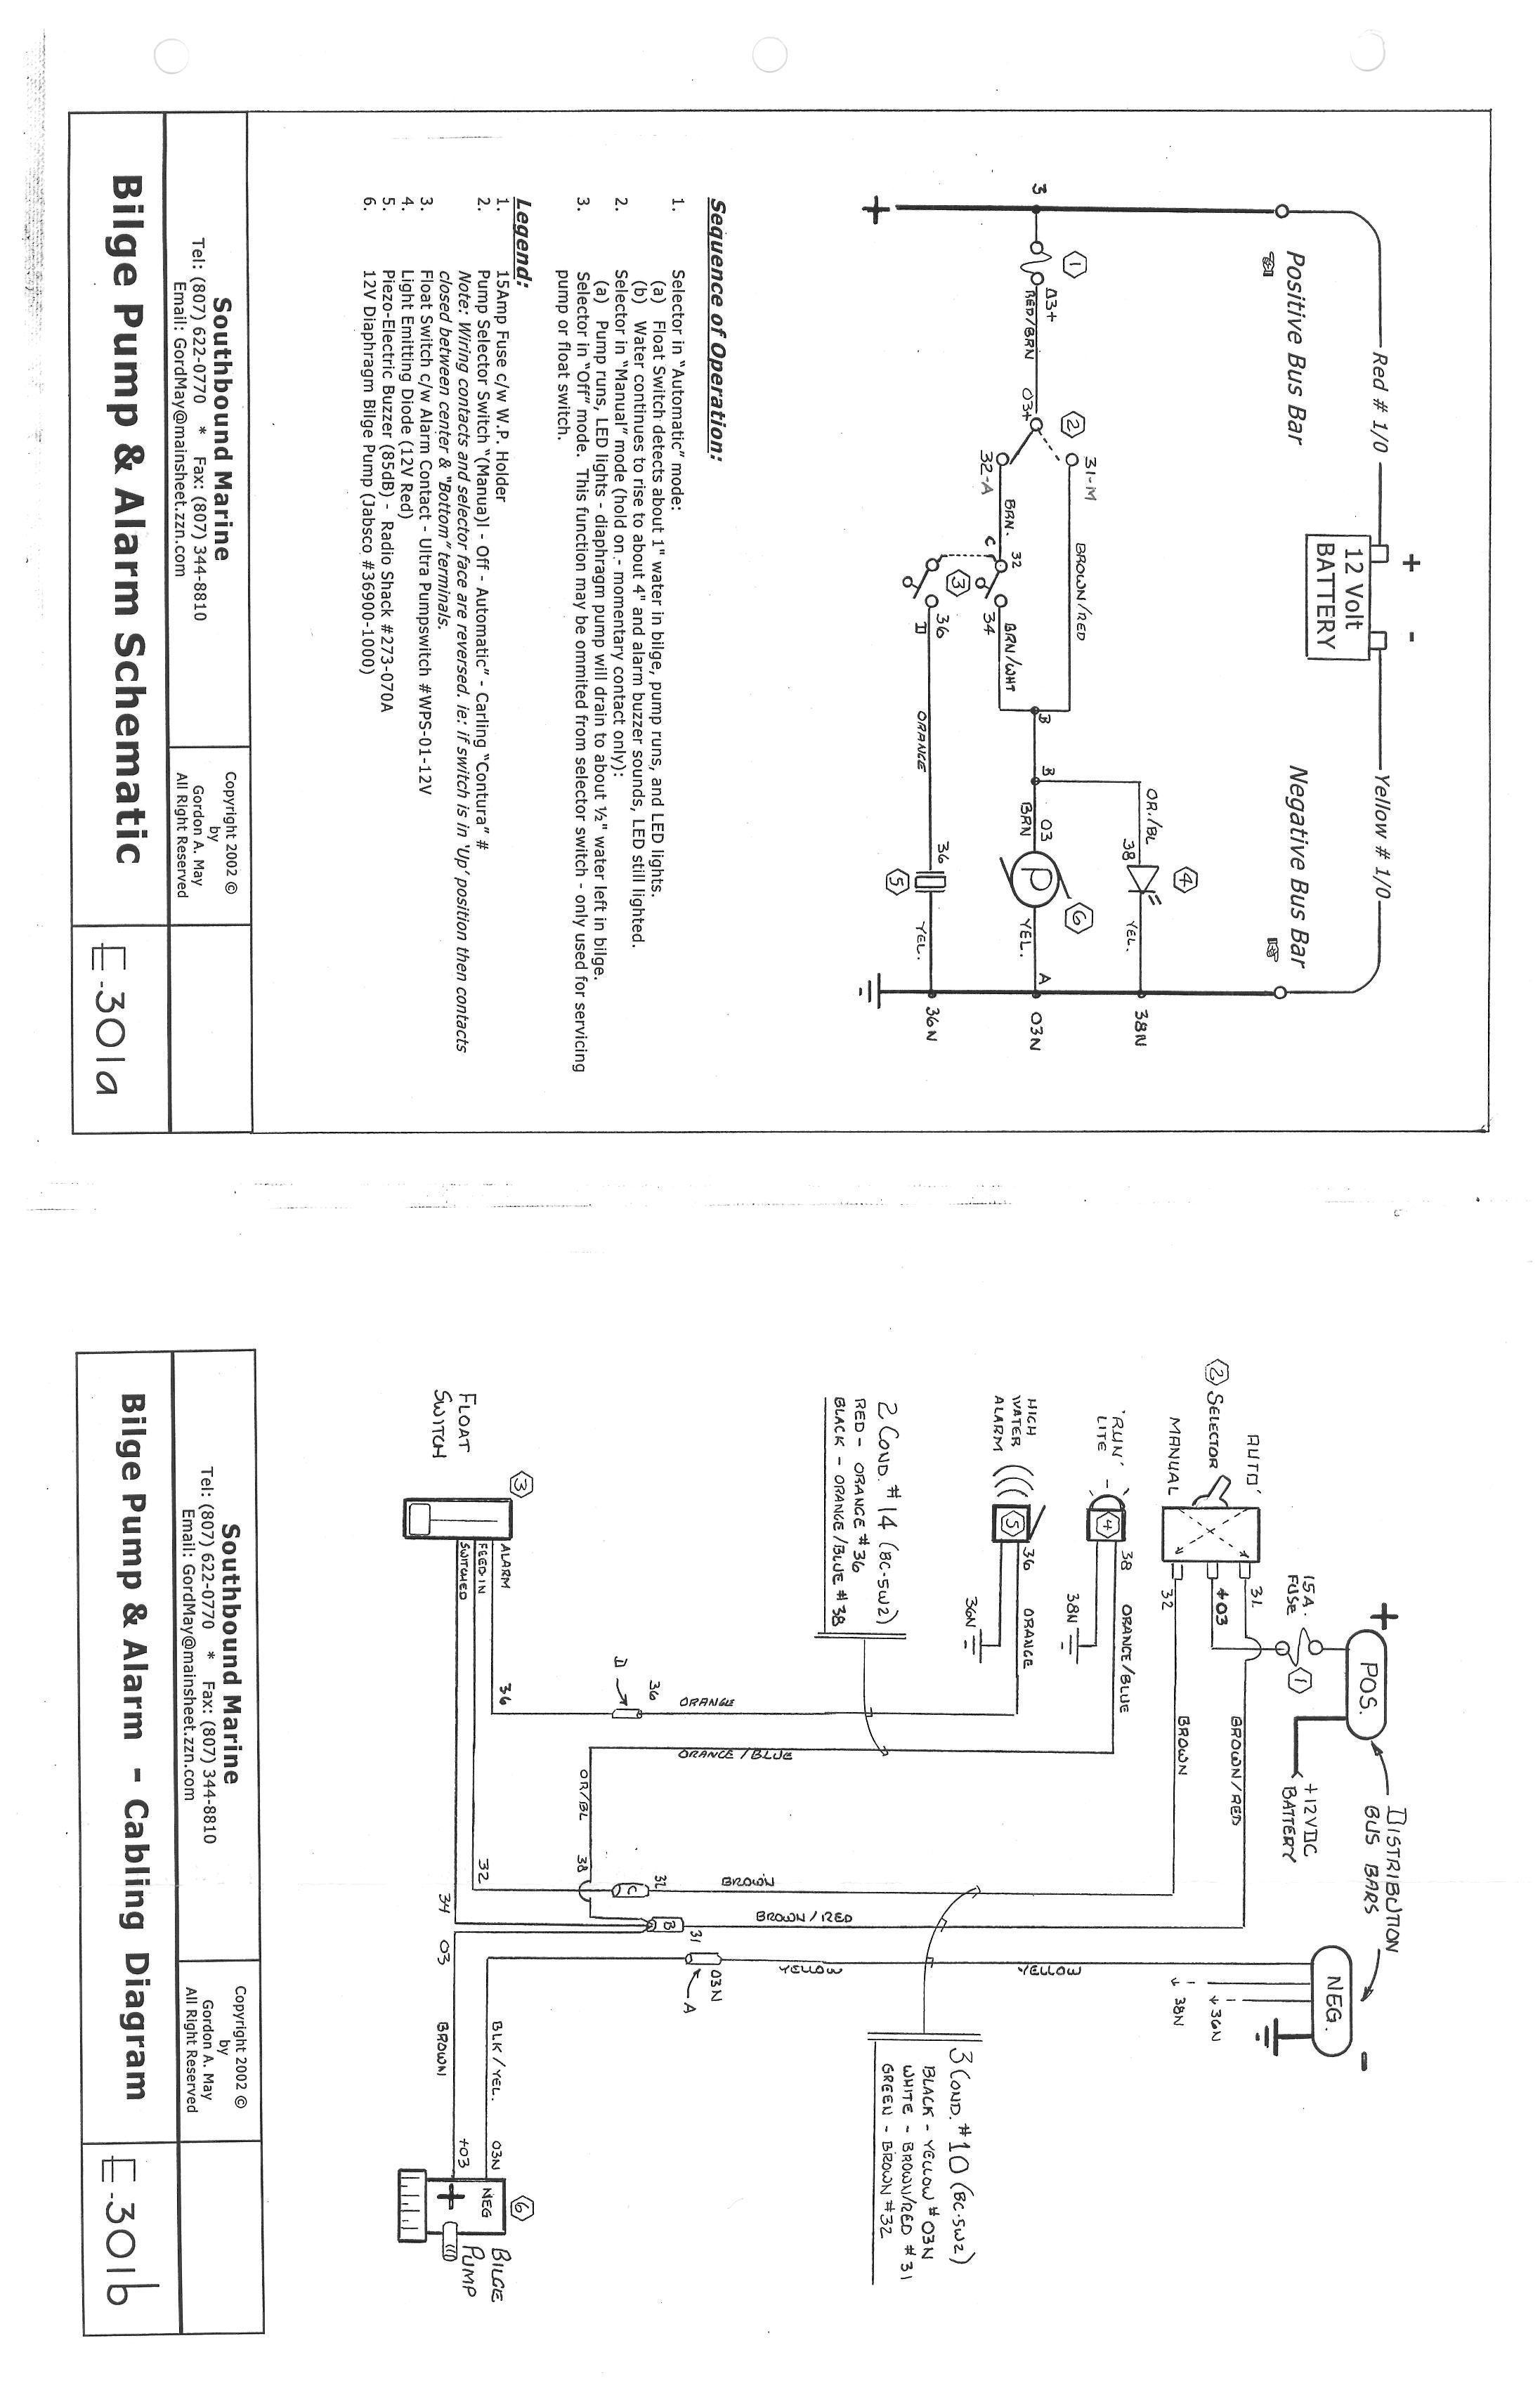 Bilge Alarm Wiring Diagram : Schematic bilge pump alarm e a cruisers sailing